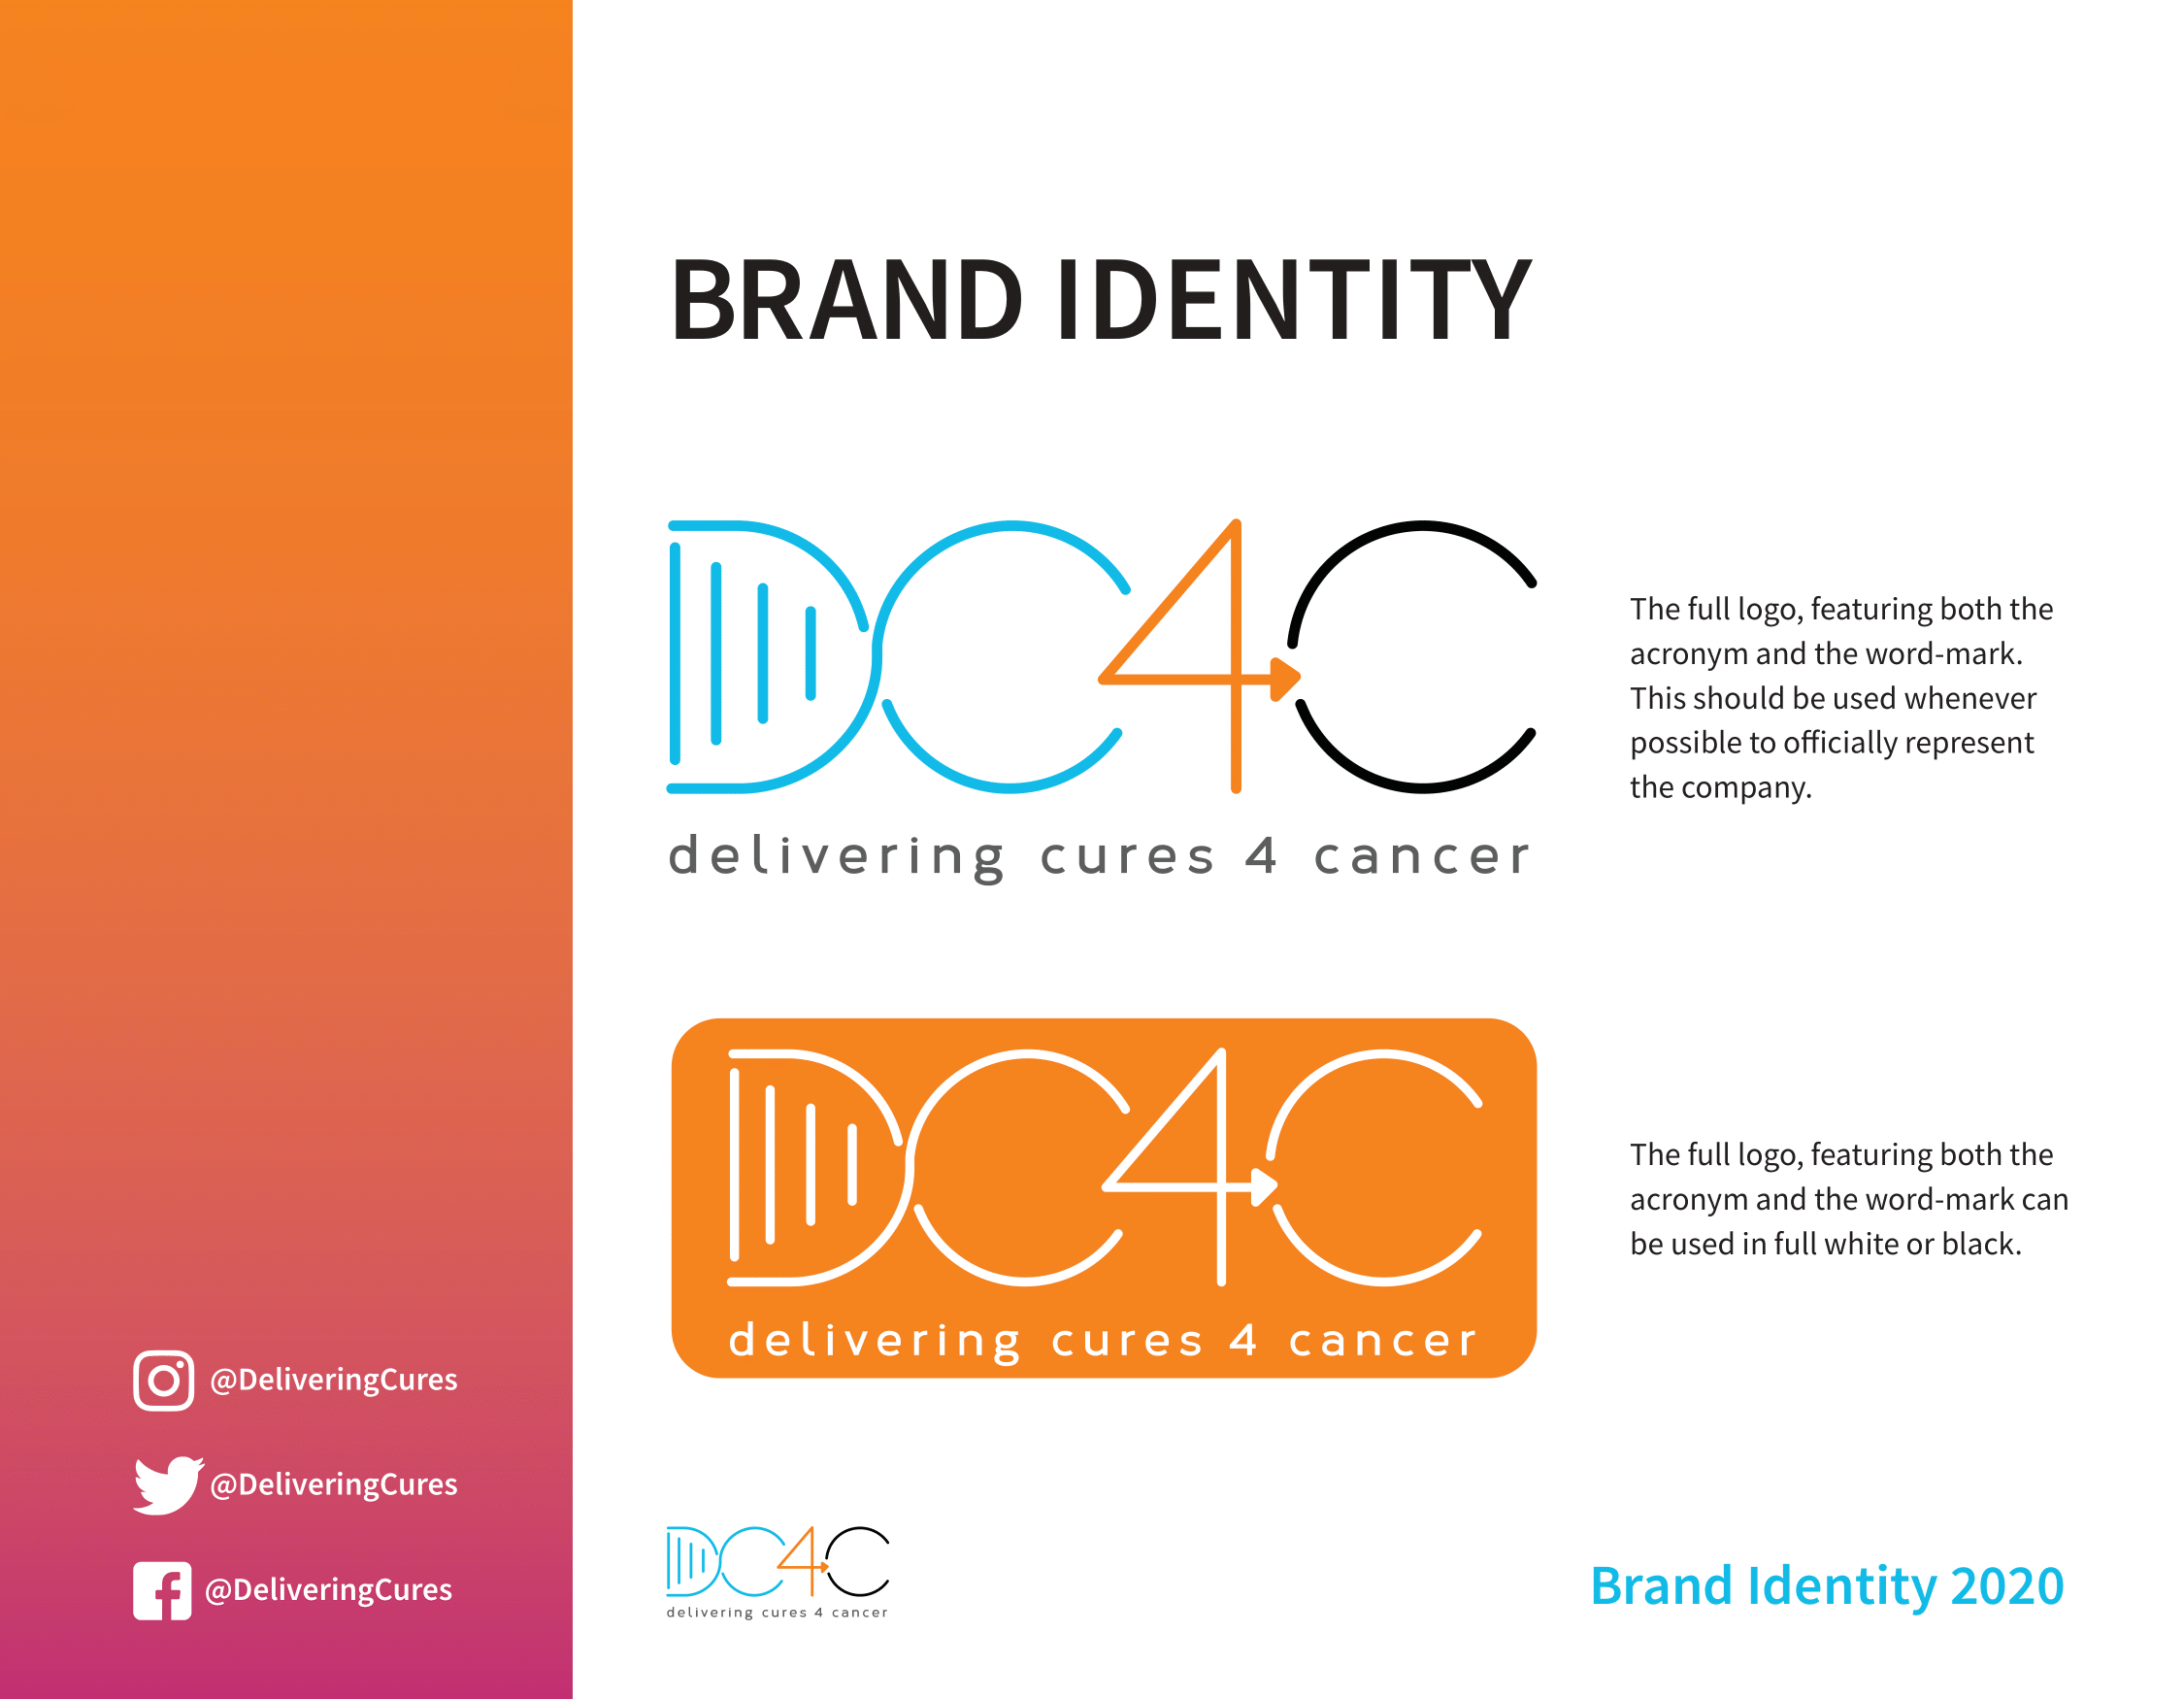 DC4C-Brand_Identity-2020-4